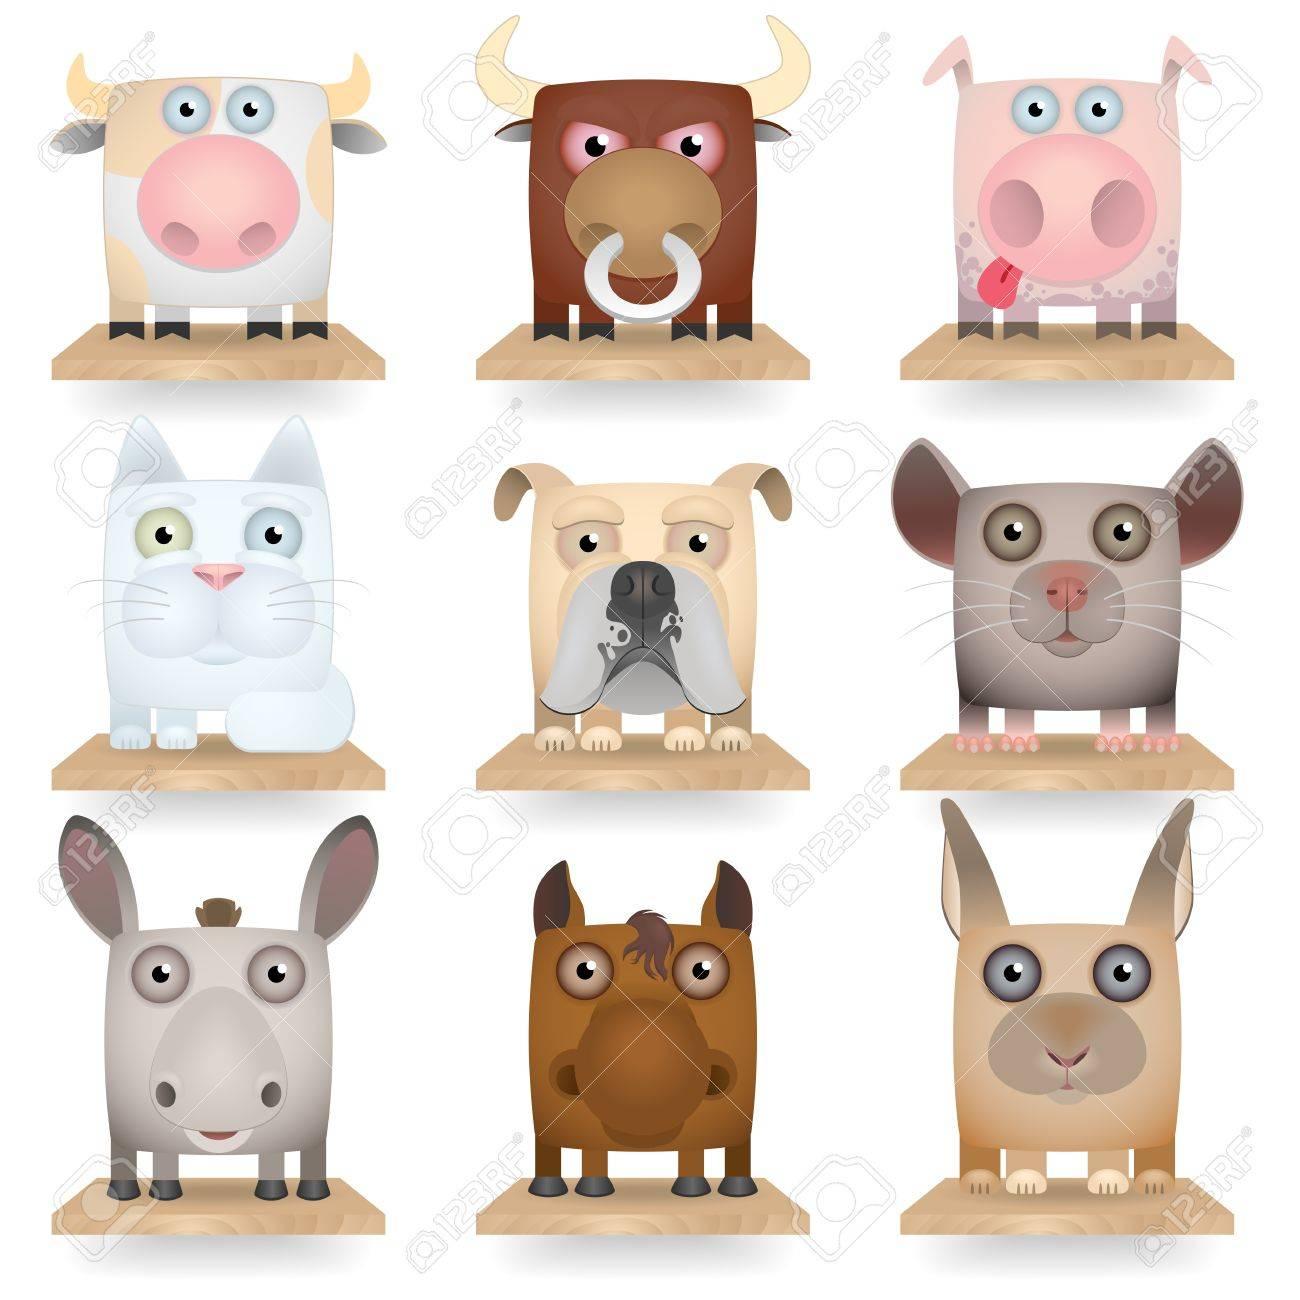 Domestic animals icon set Stock Vector - 17356869